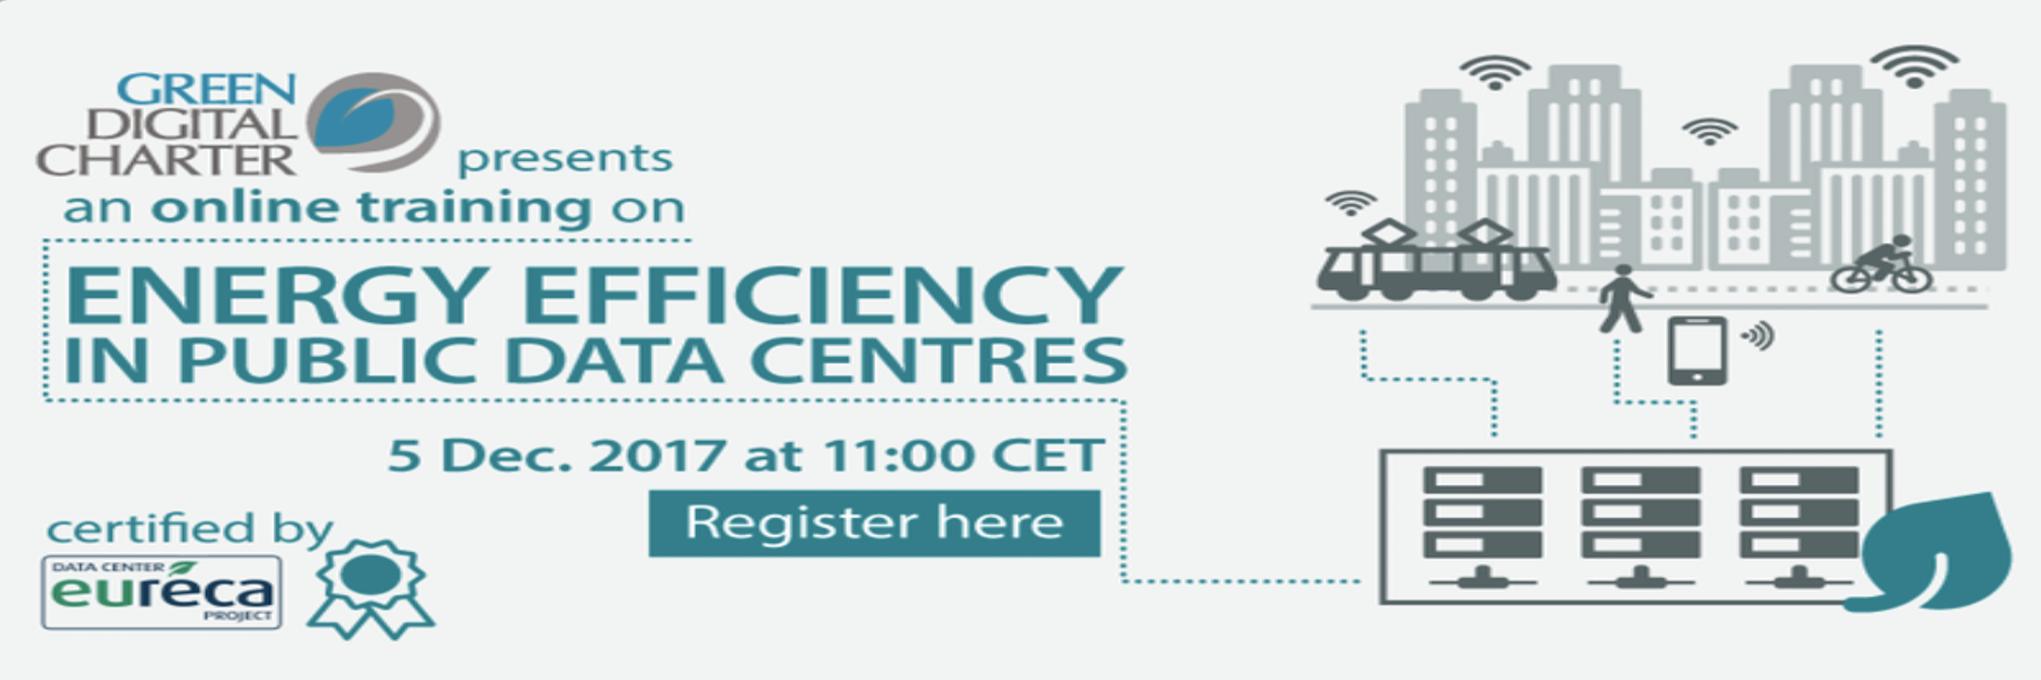 Technology Management Image: Green Digital Charter (GDC) Online Training On 'Energy